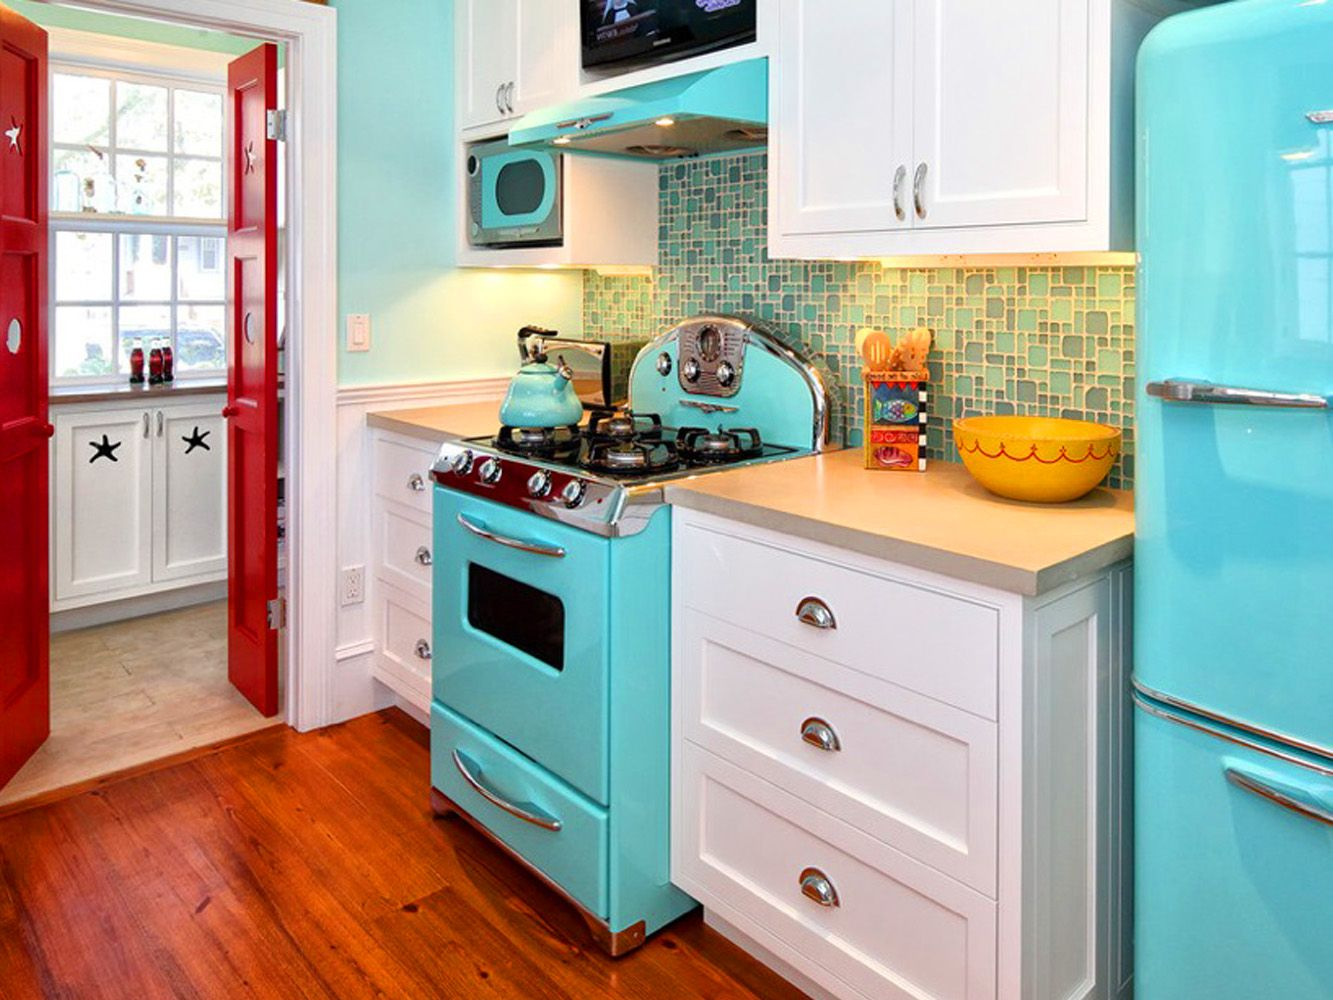 1950s Home Decor Interiors Color Pastel Aqua Red Image